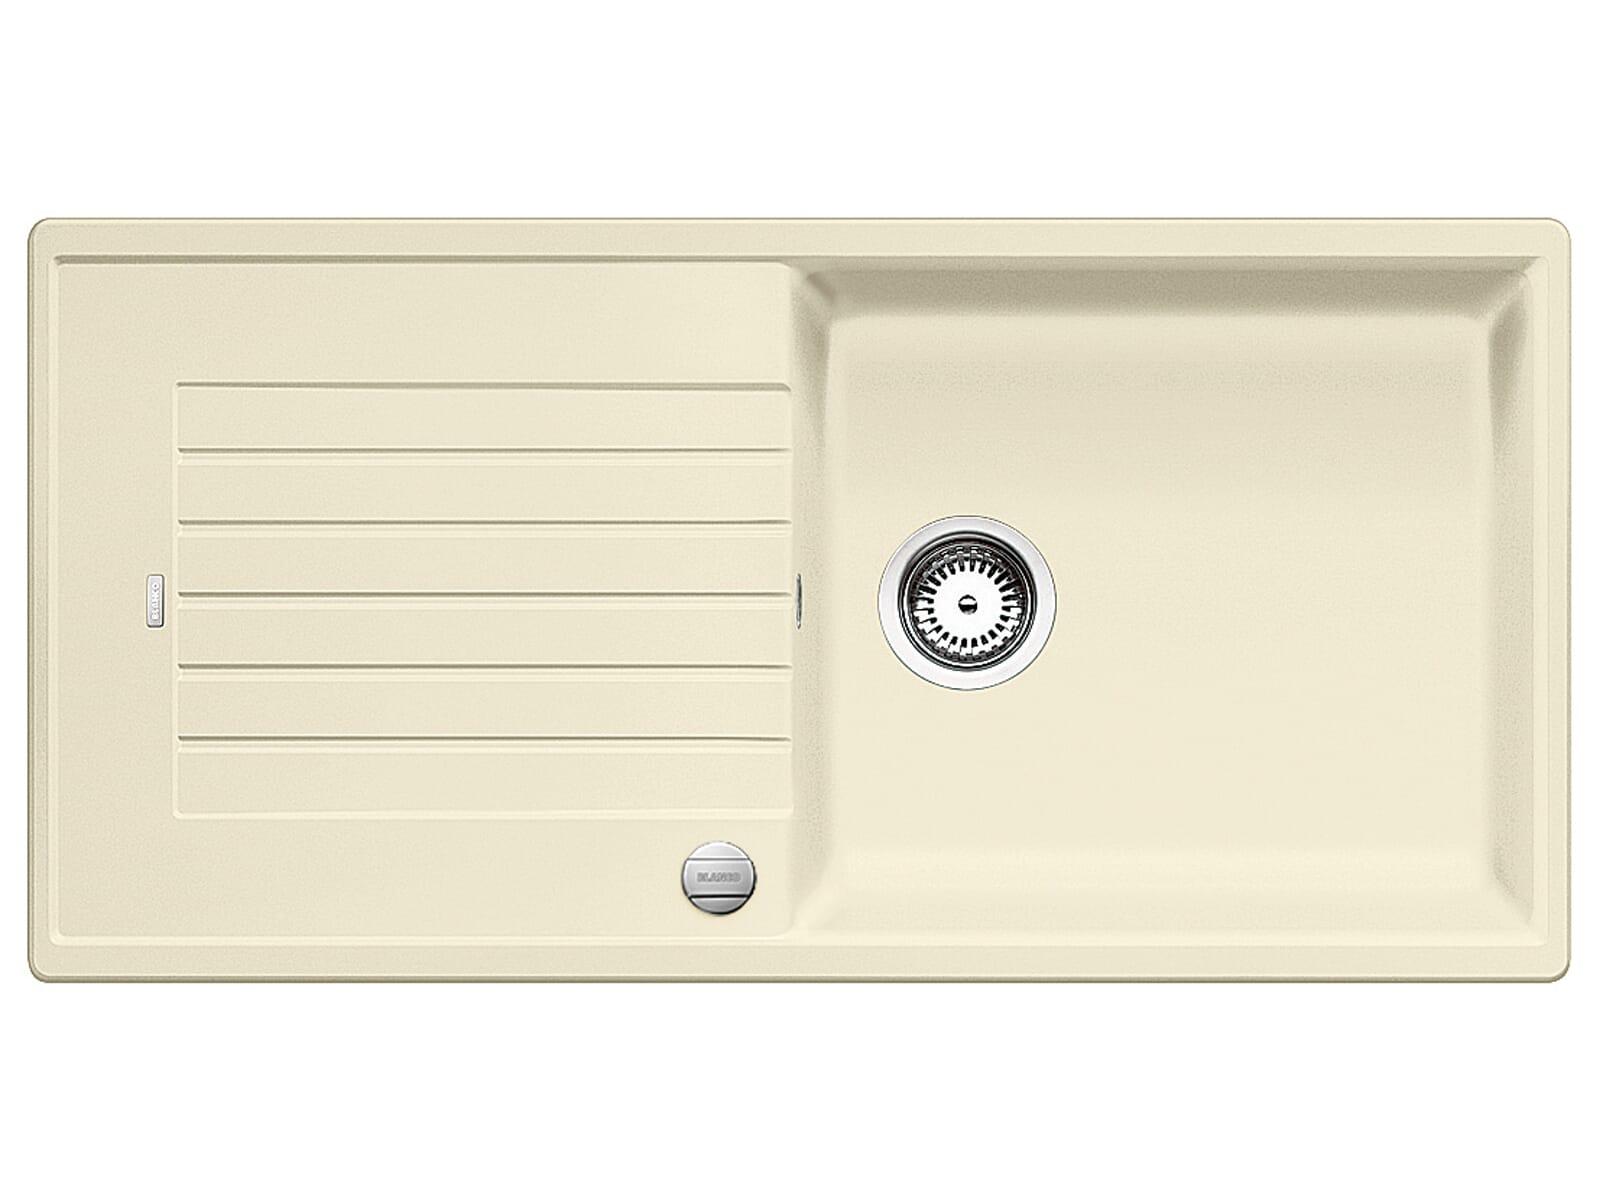 Blanco Zia XL 6 S Jasmin - 517 562 Granitspüle